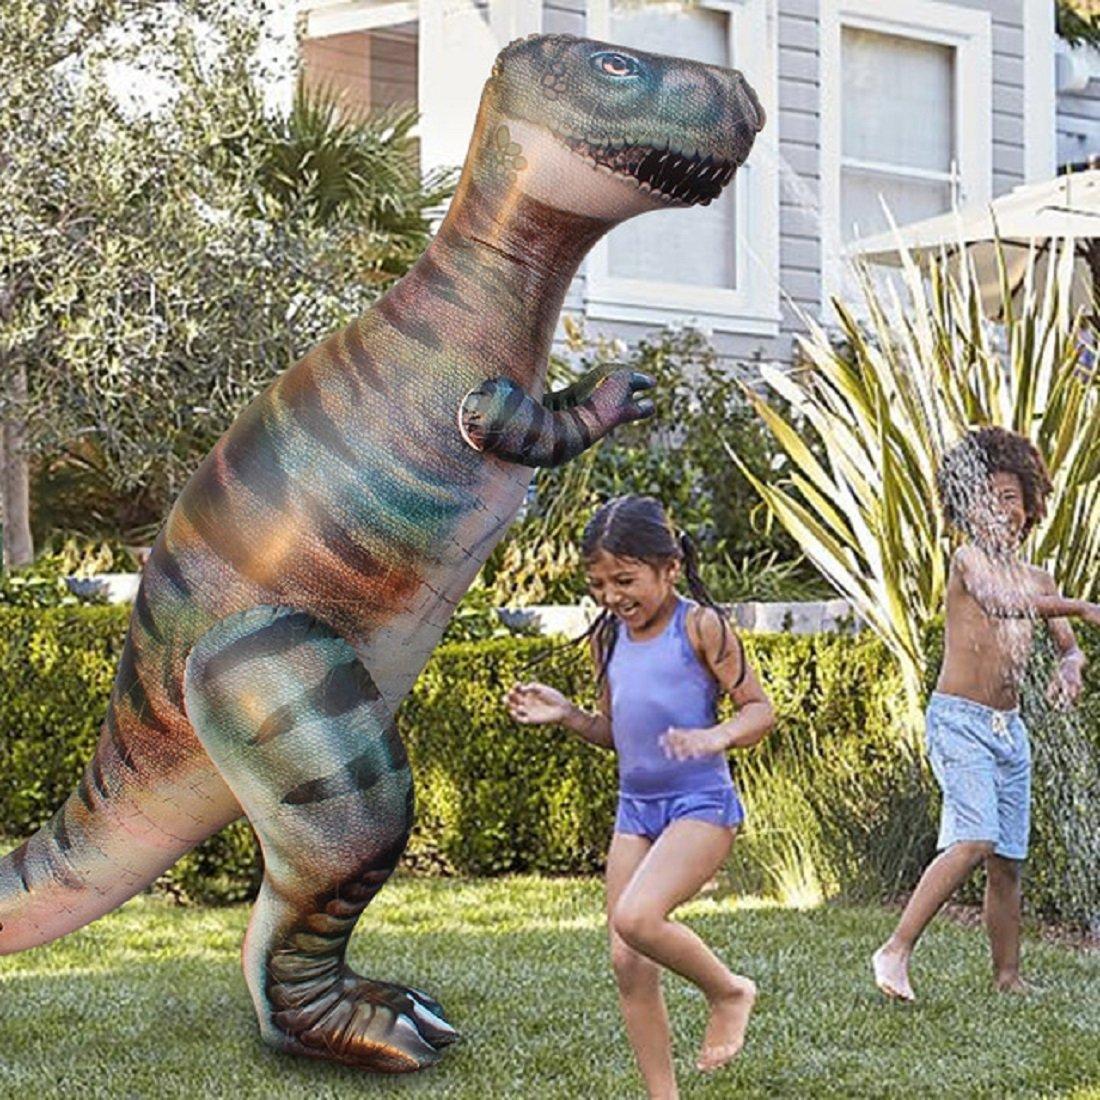 zhenyu 1.8M Dino Grass Water Sprayer Sprinkler Kids Inflatable Pool Toys Outdoor Sports Ginormous T-Rex Dinosaur Yard Sprinkler Splash